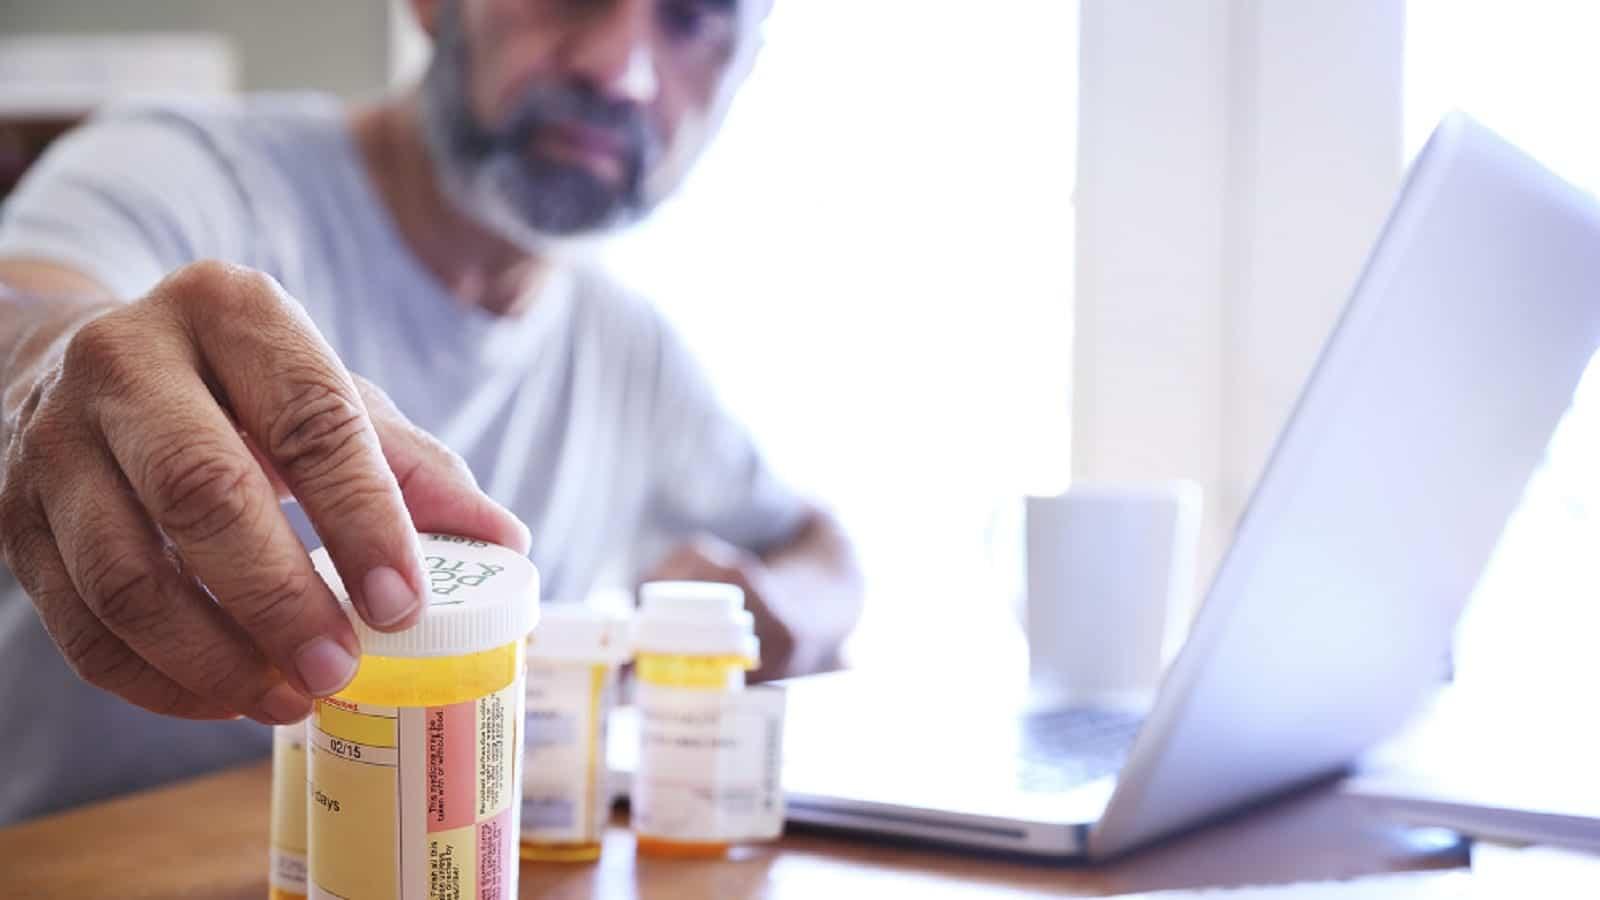 Man Reaching For Prescription Medication Stock Photo